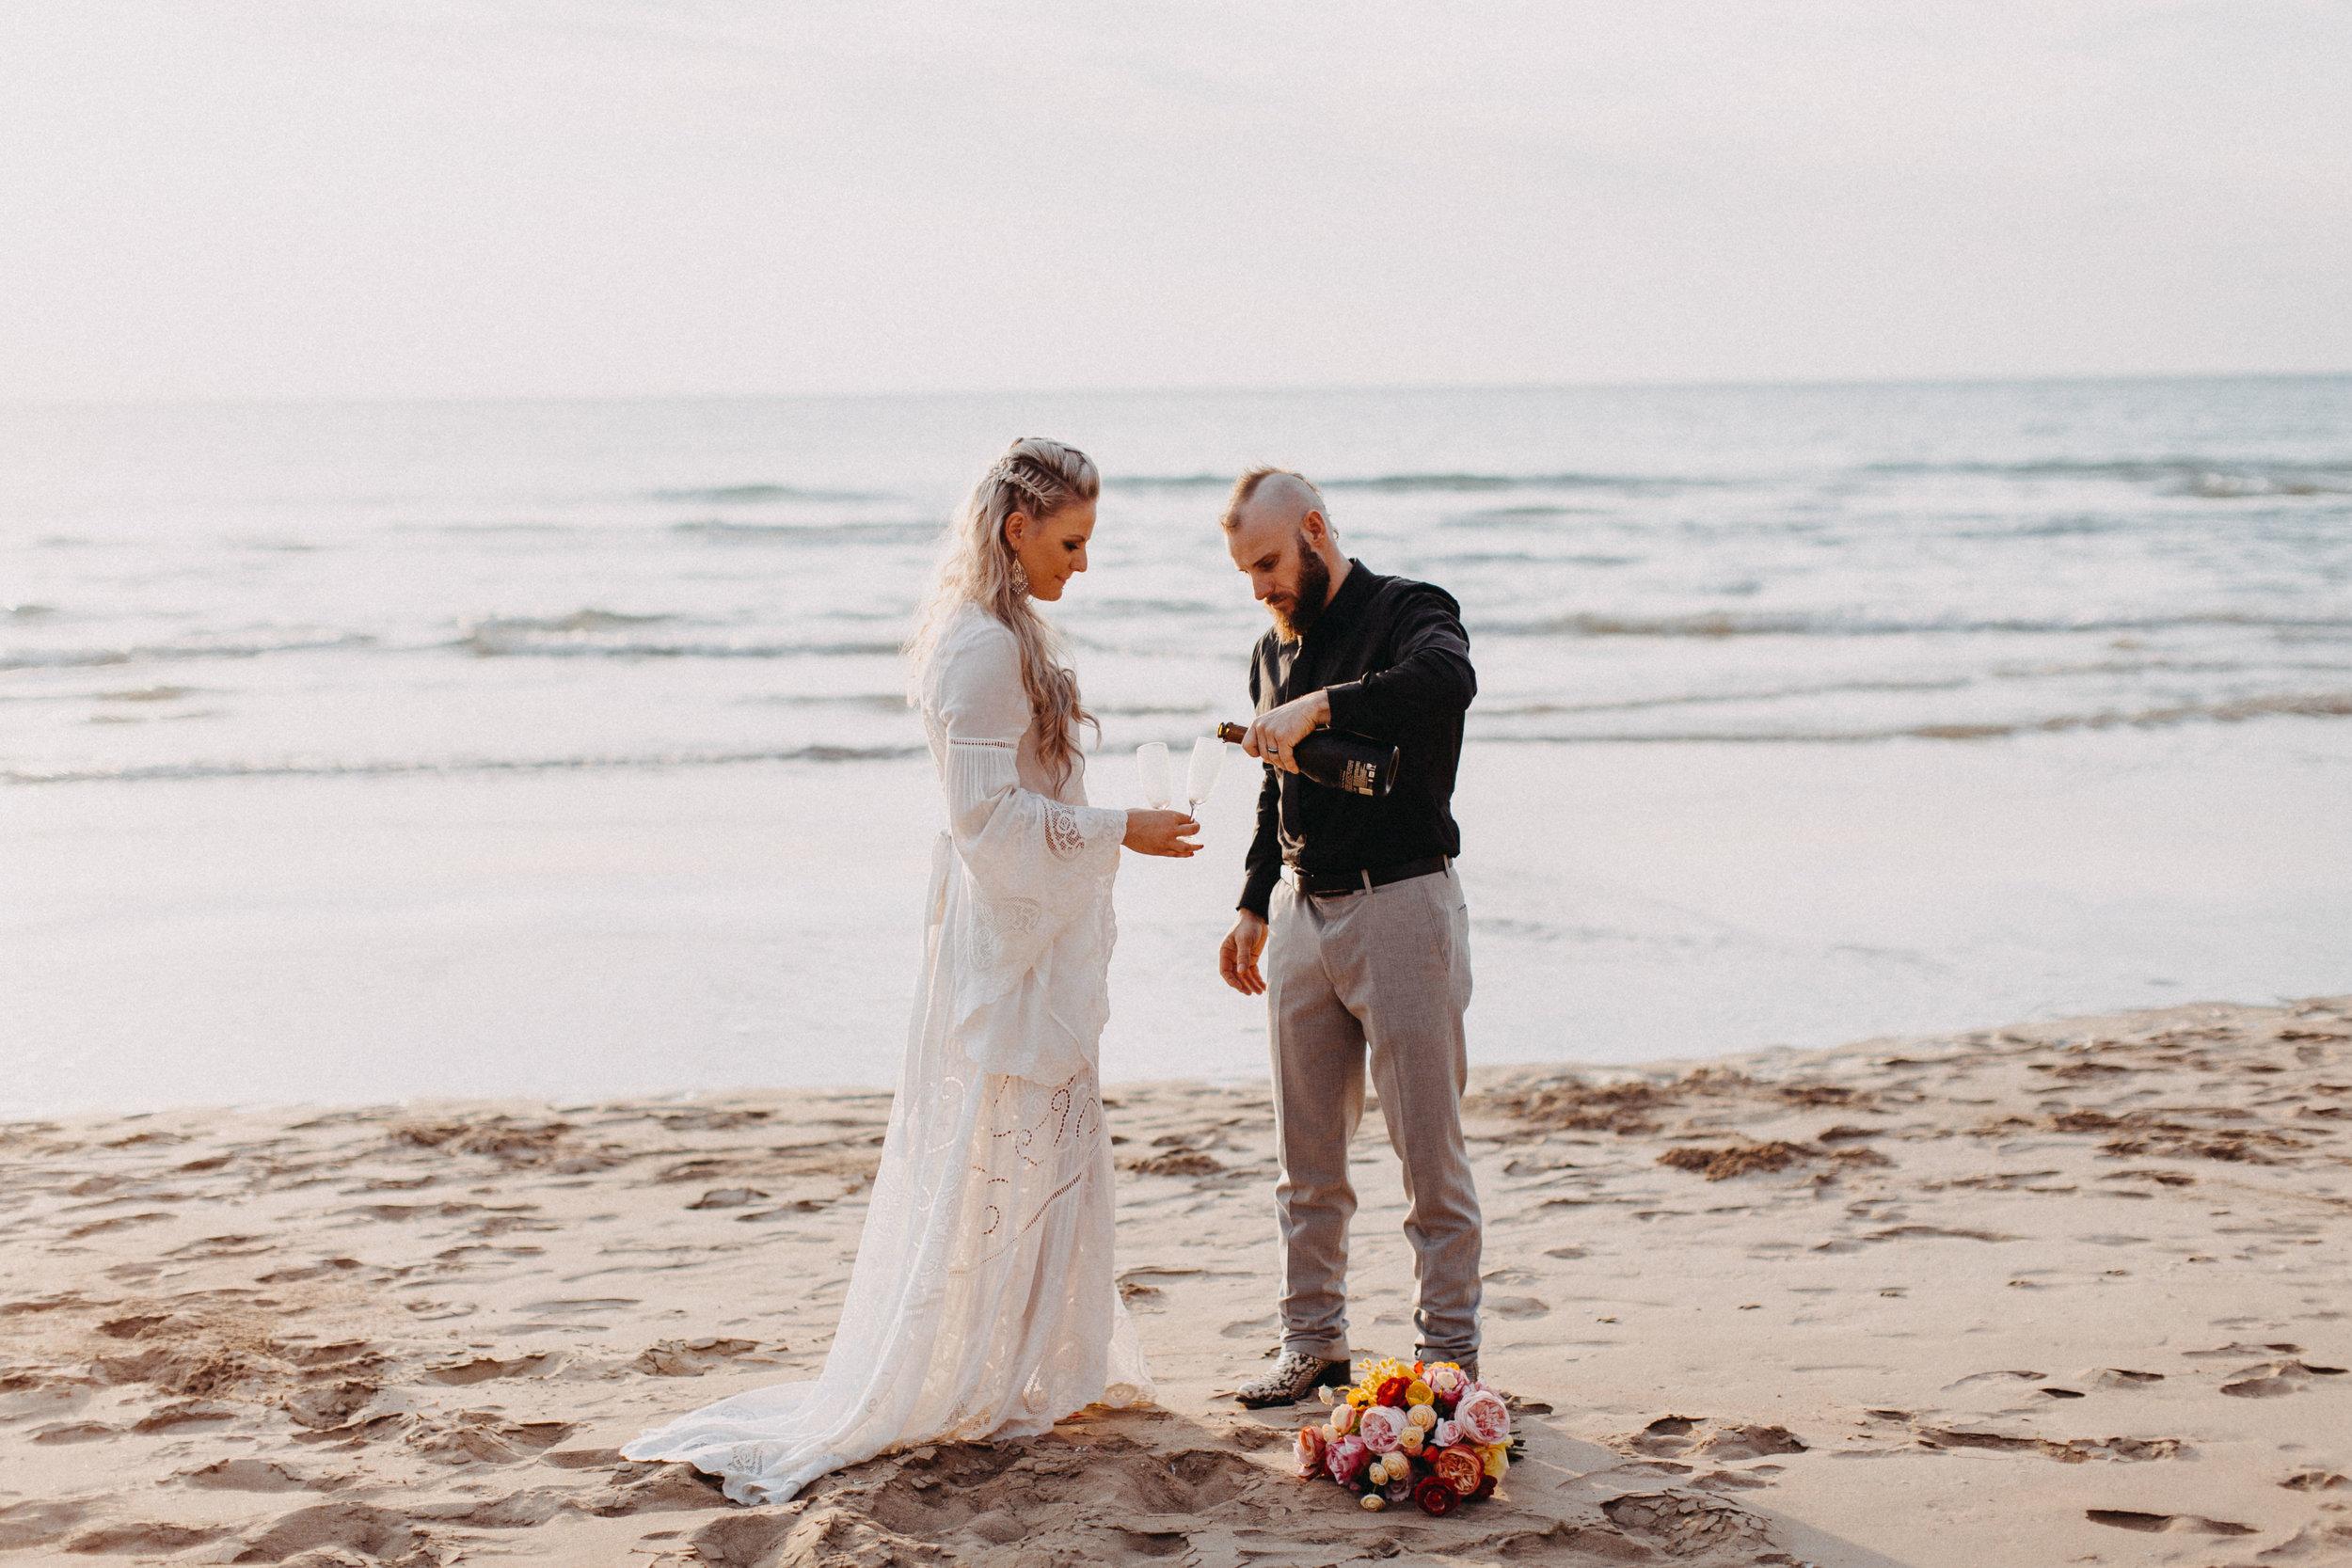 darwin-elopement-wedding-beach-camden-photography-www.emilyobrienphotography.net-64.jpg